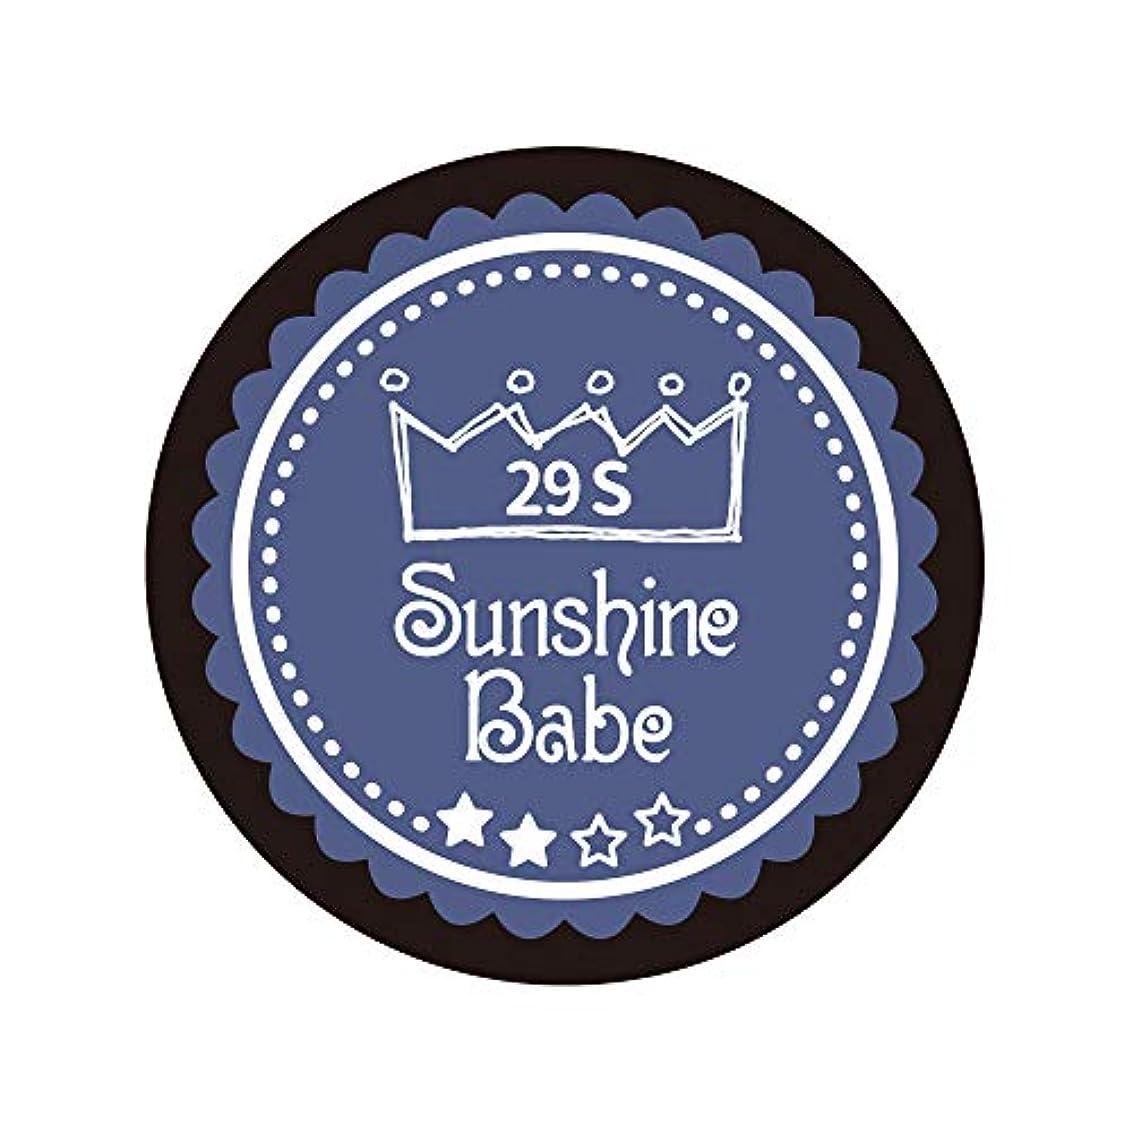 Sunshine Babe カラージェル 29S ネイビーグレー 2.7g UV/LED対応